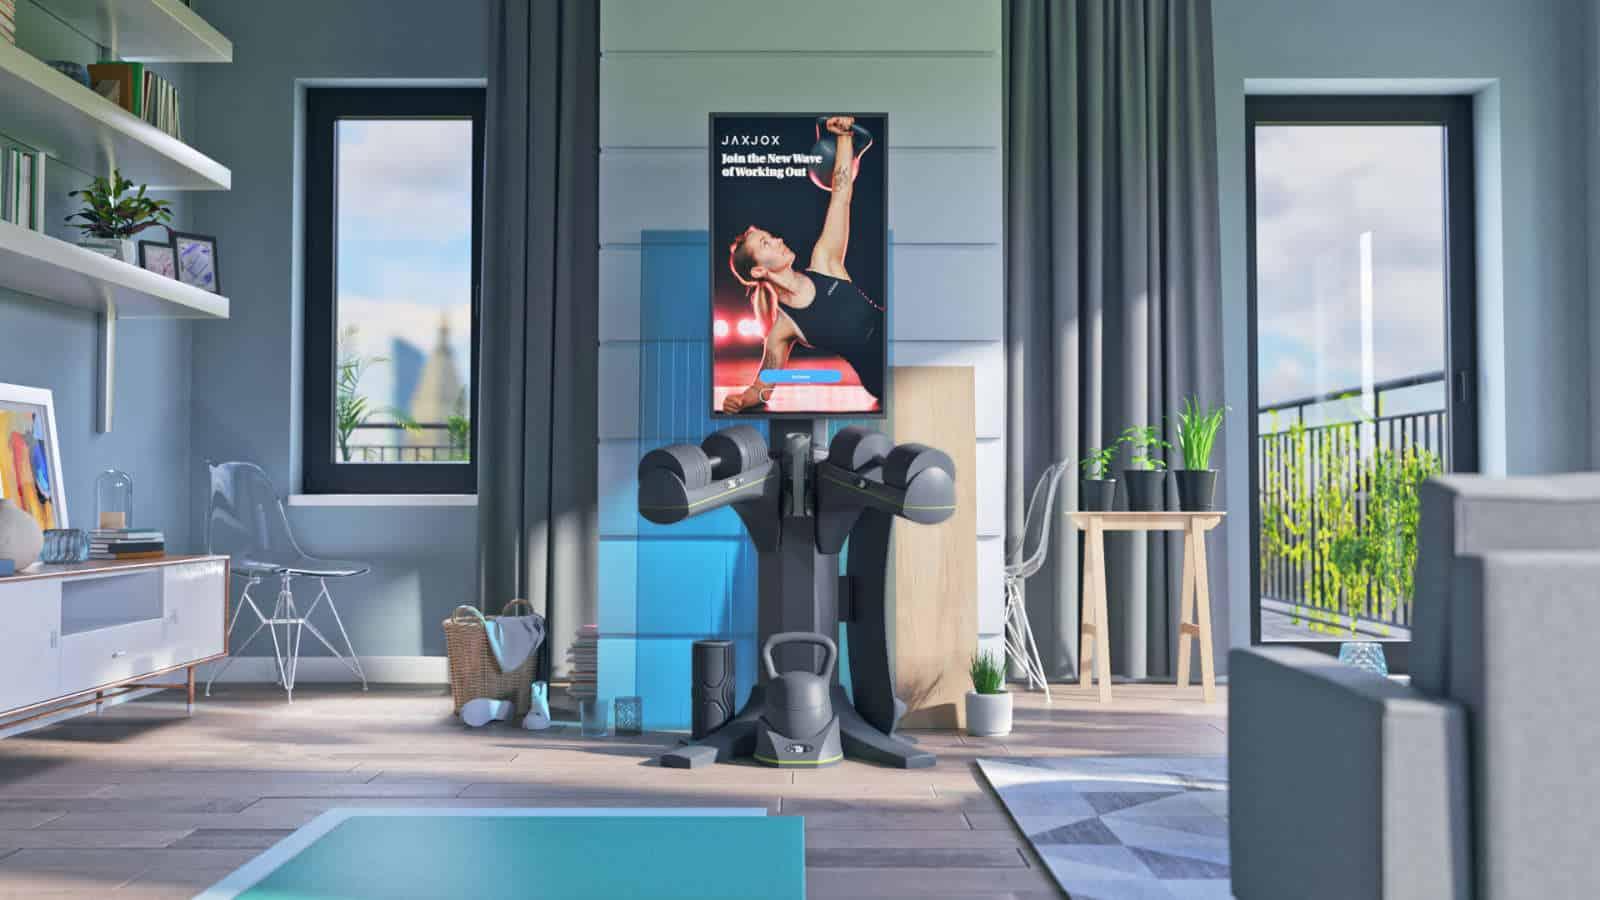 jaxjox interactive studio fitness center